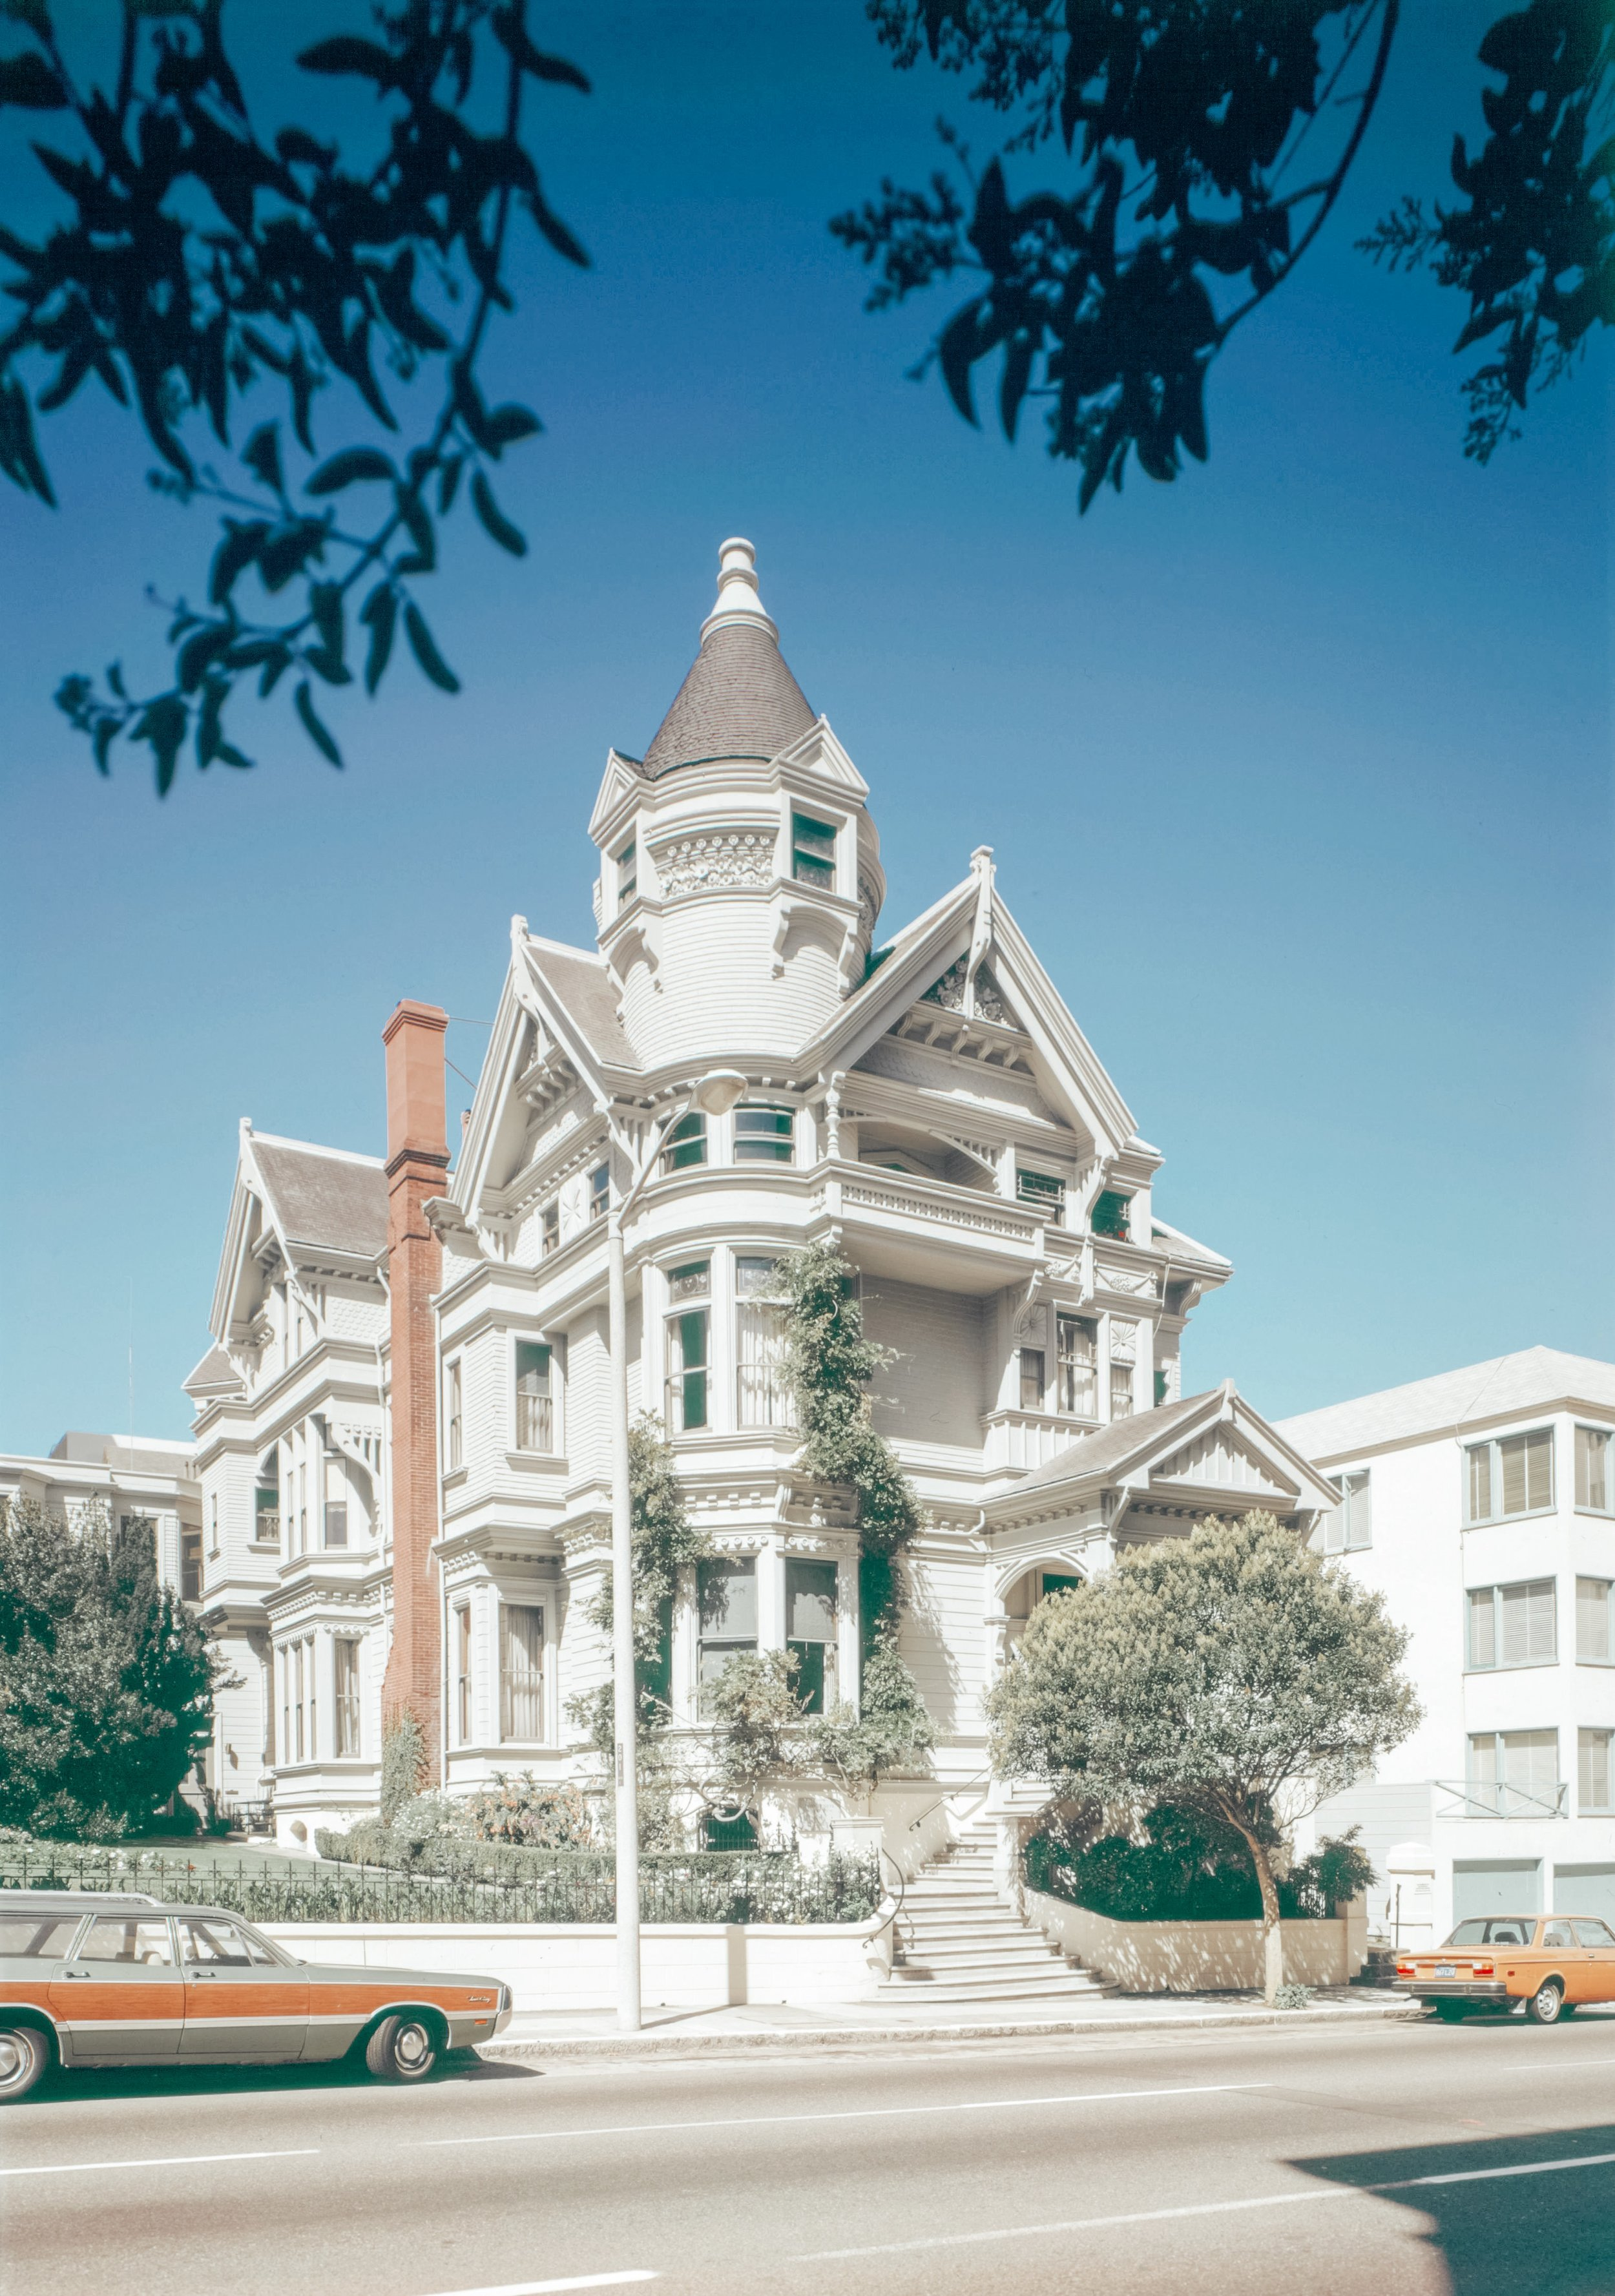 Haas-Lilienthal_House__San_Francisco_ 2.JPG